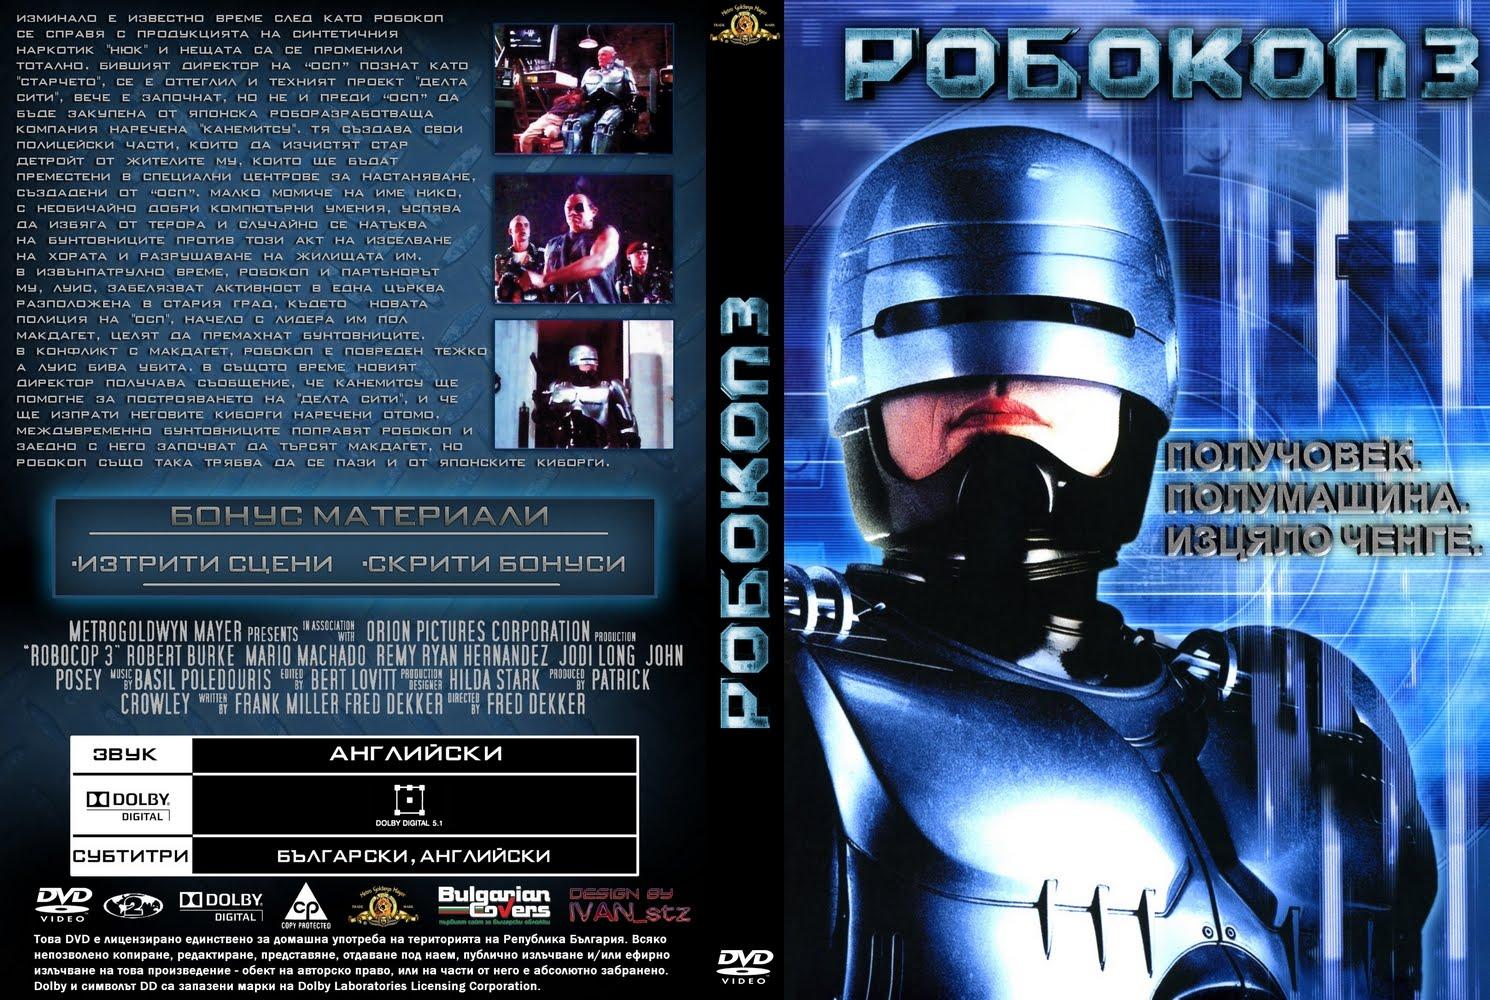 robocop dvd cover